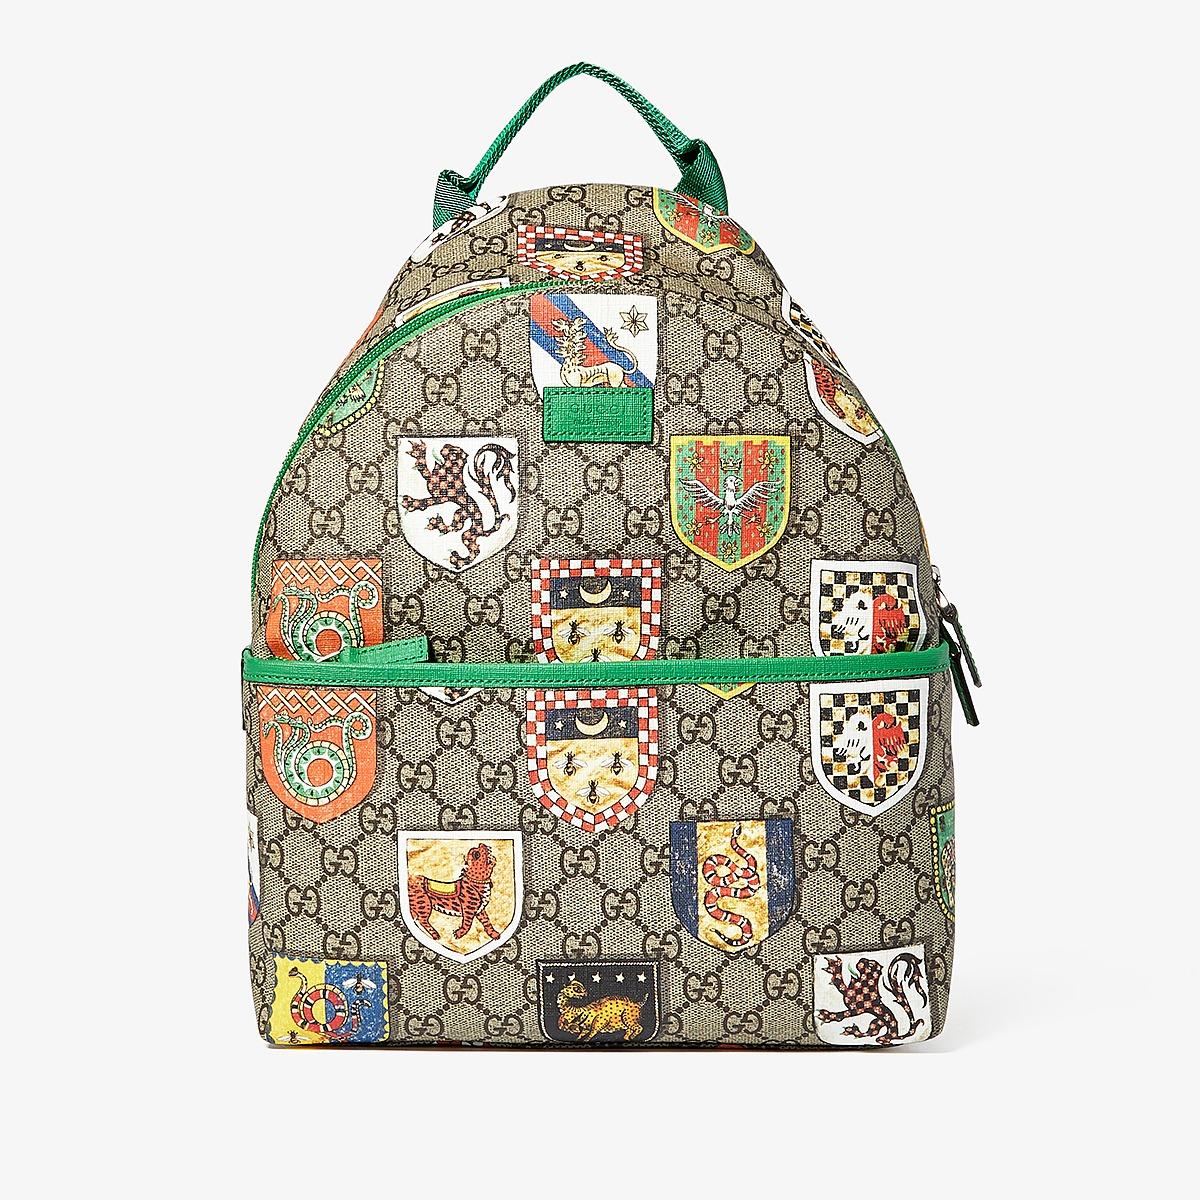 Gucci Kids - Backpack 2713279CX5N (Little Kids/Big Kids) (Brown/Green) Backpack Bags